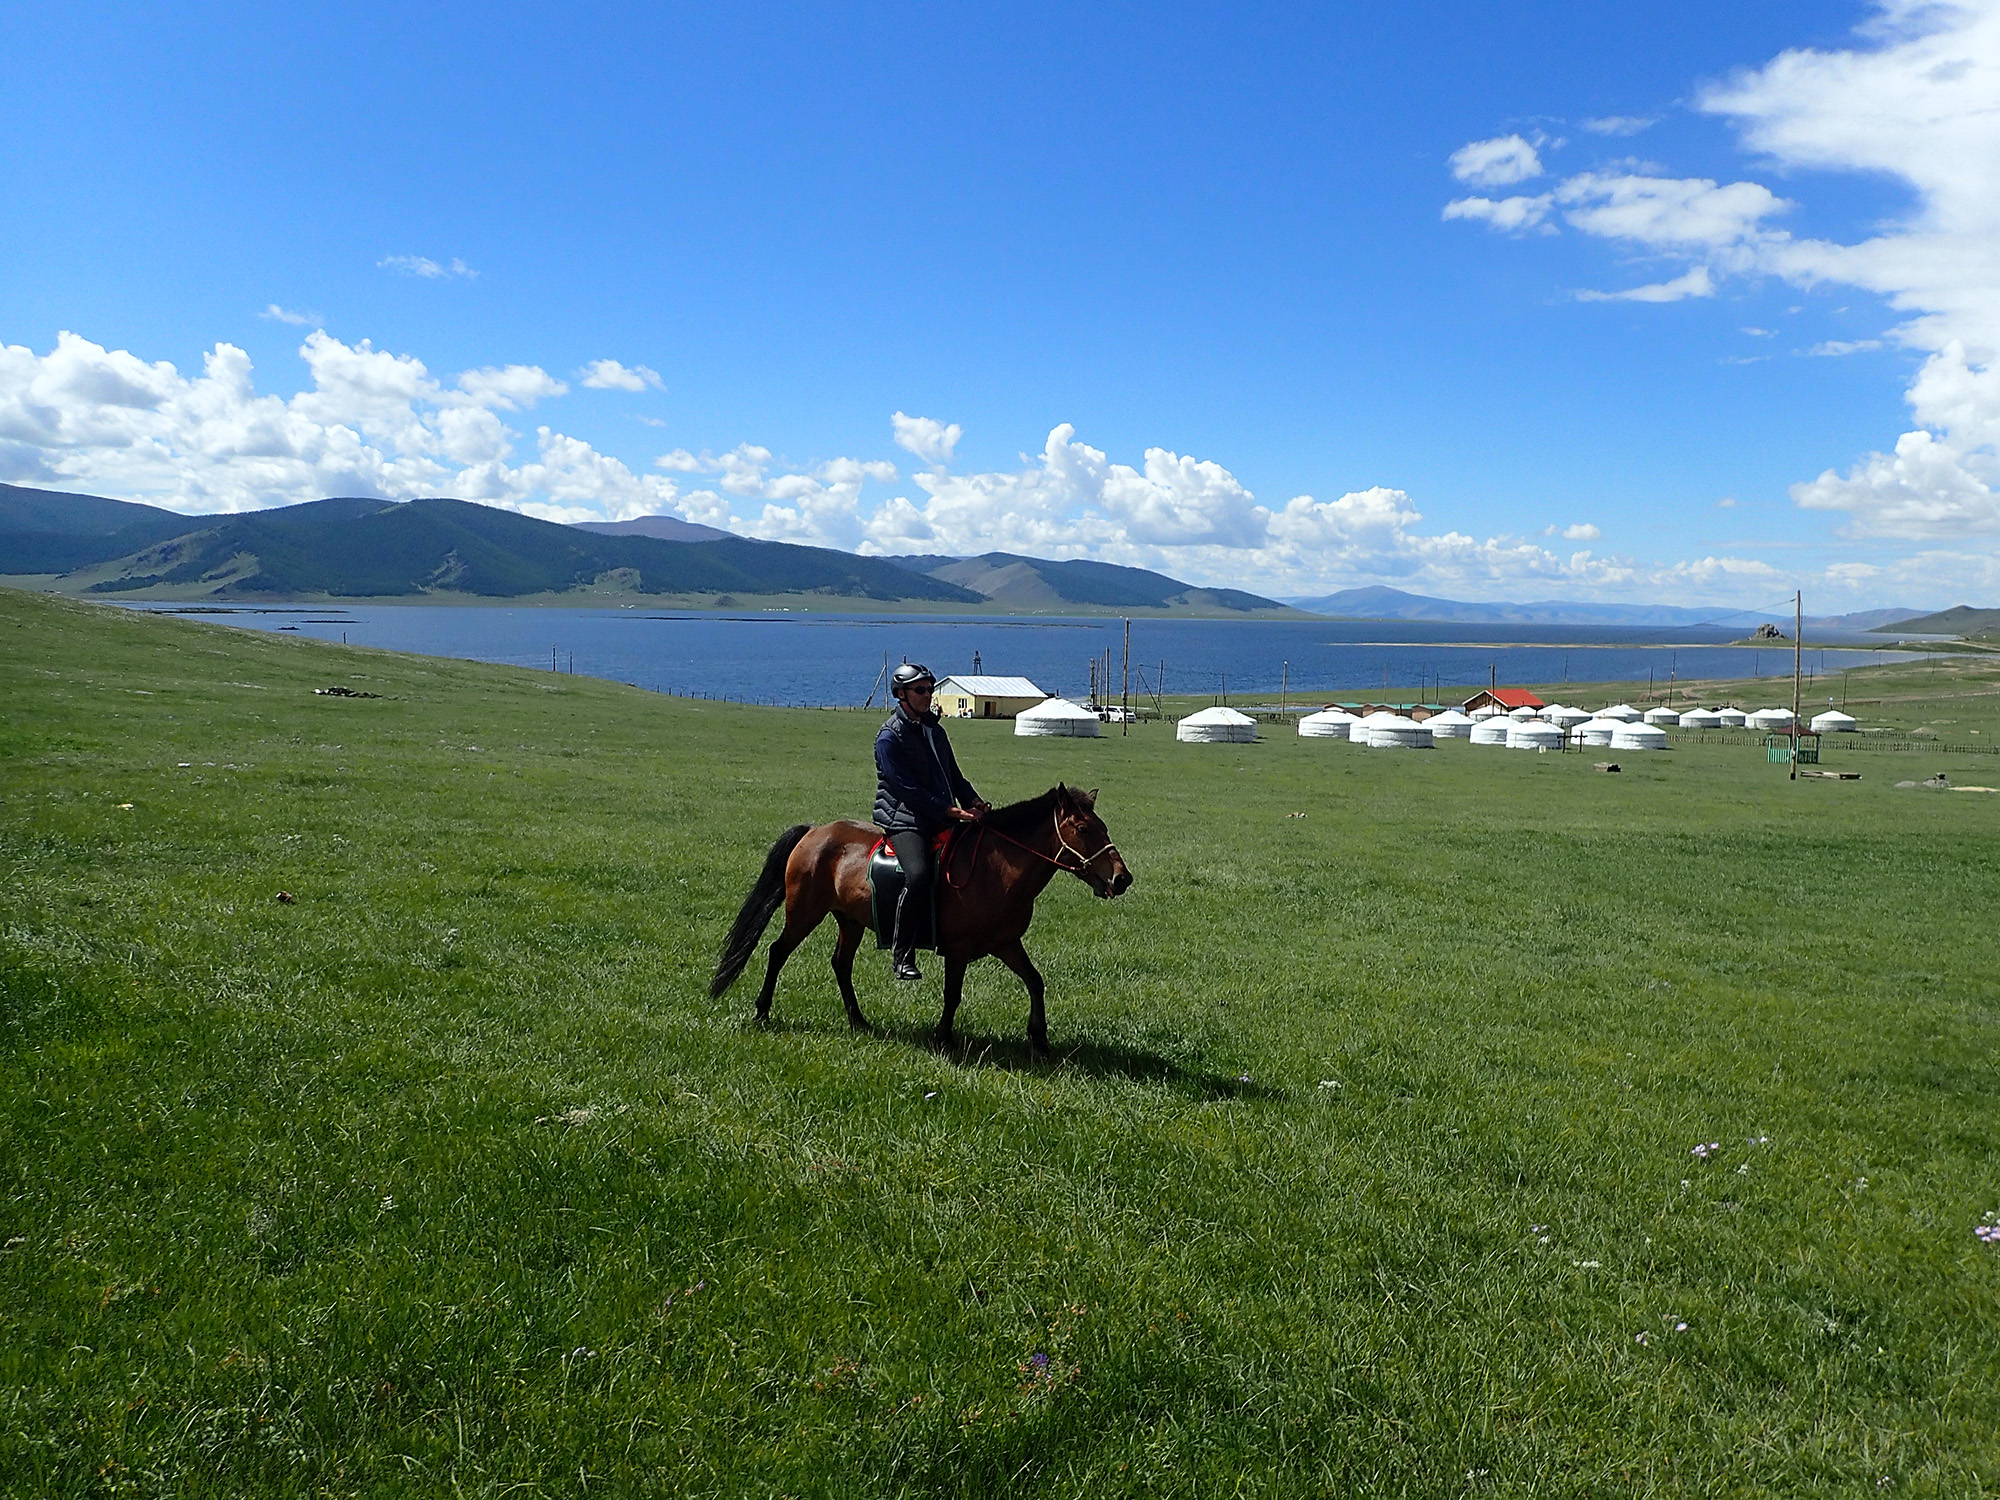 mongolie-transmongolia-rando-cheval-aven